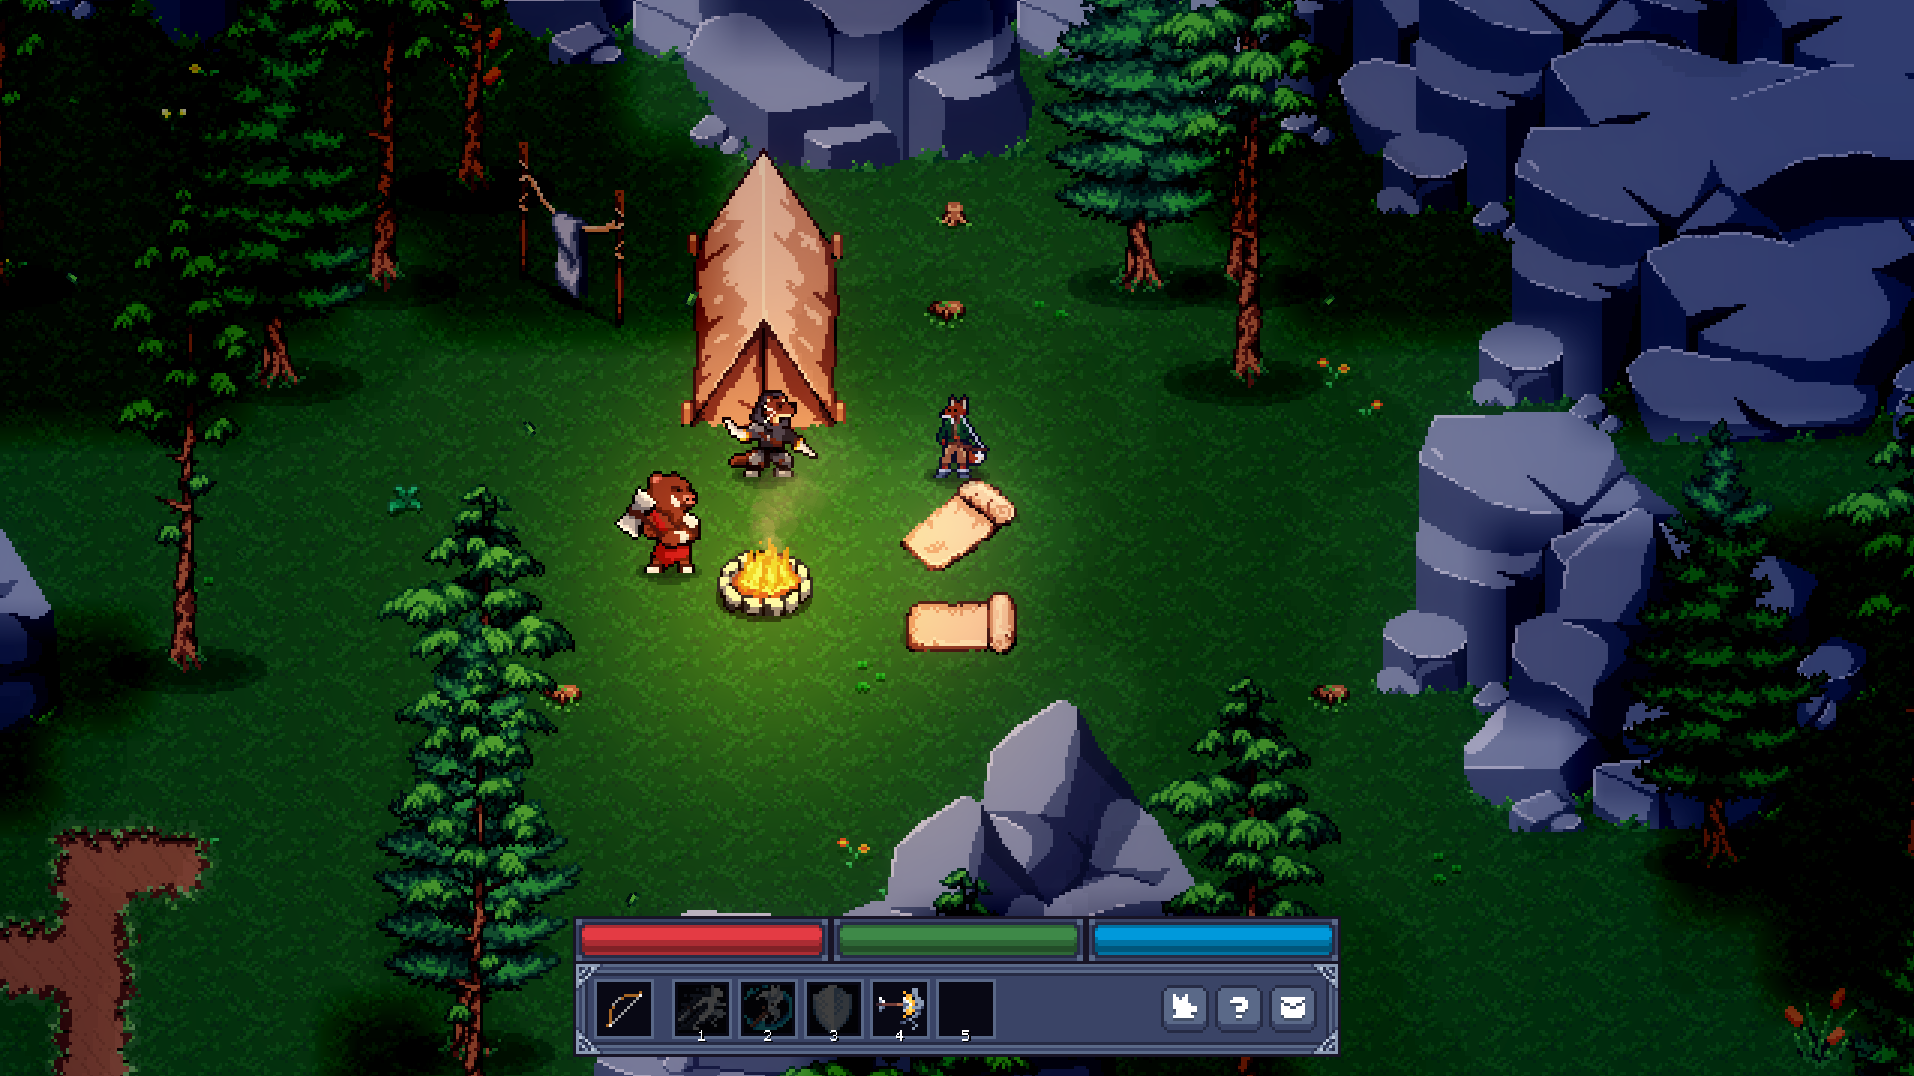 Untitled Turn-Based RPG